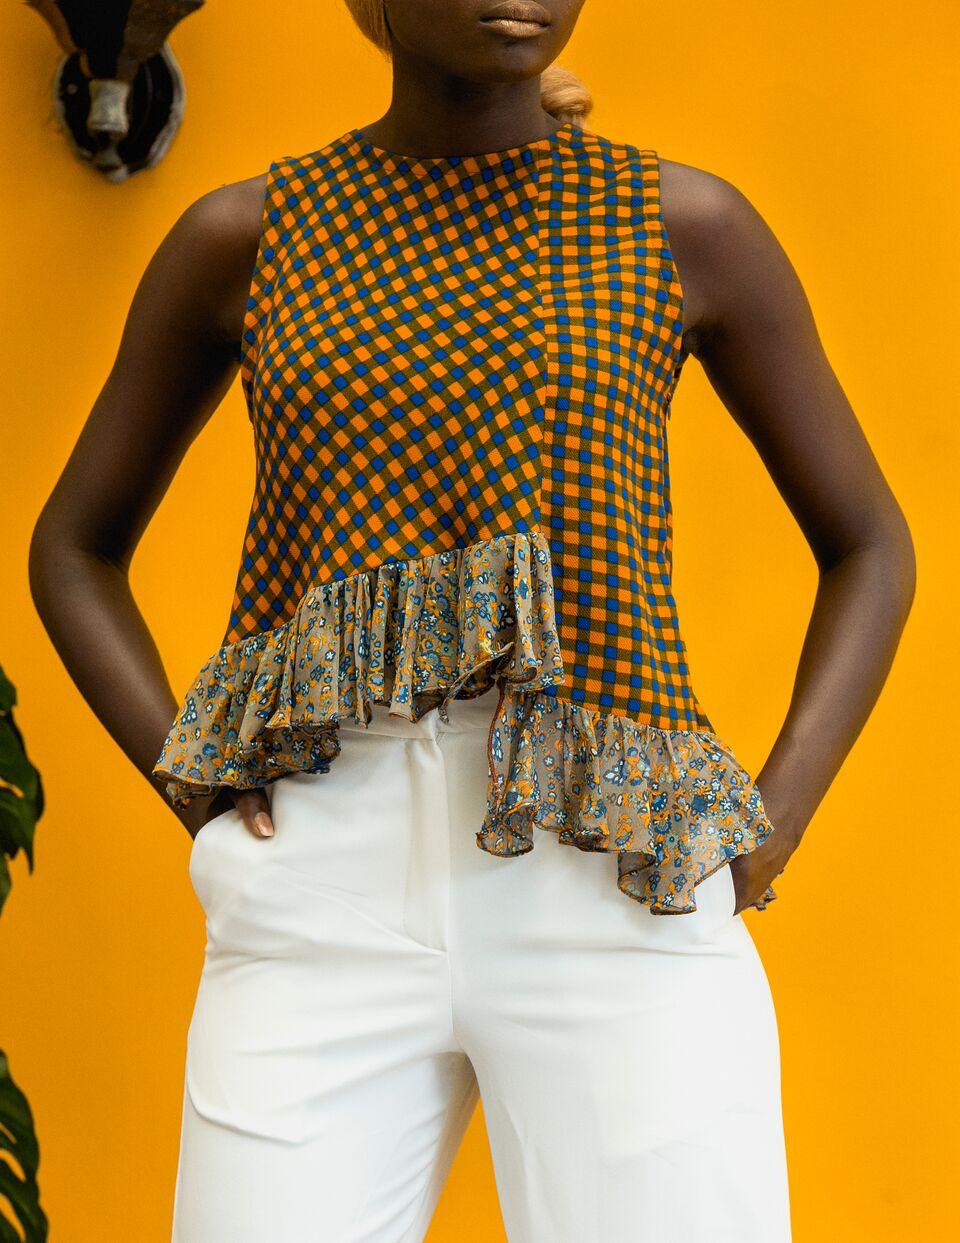 Wanger Ayu A:W 17 - BN Style - BellaNaija.com - 010